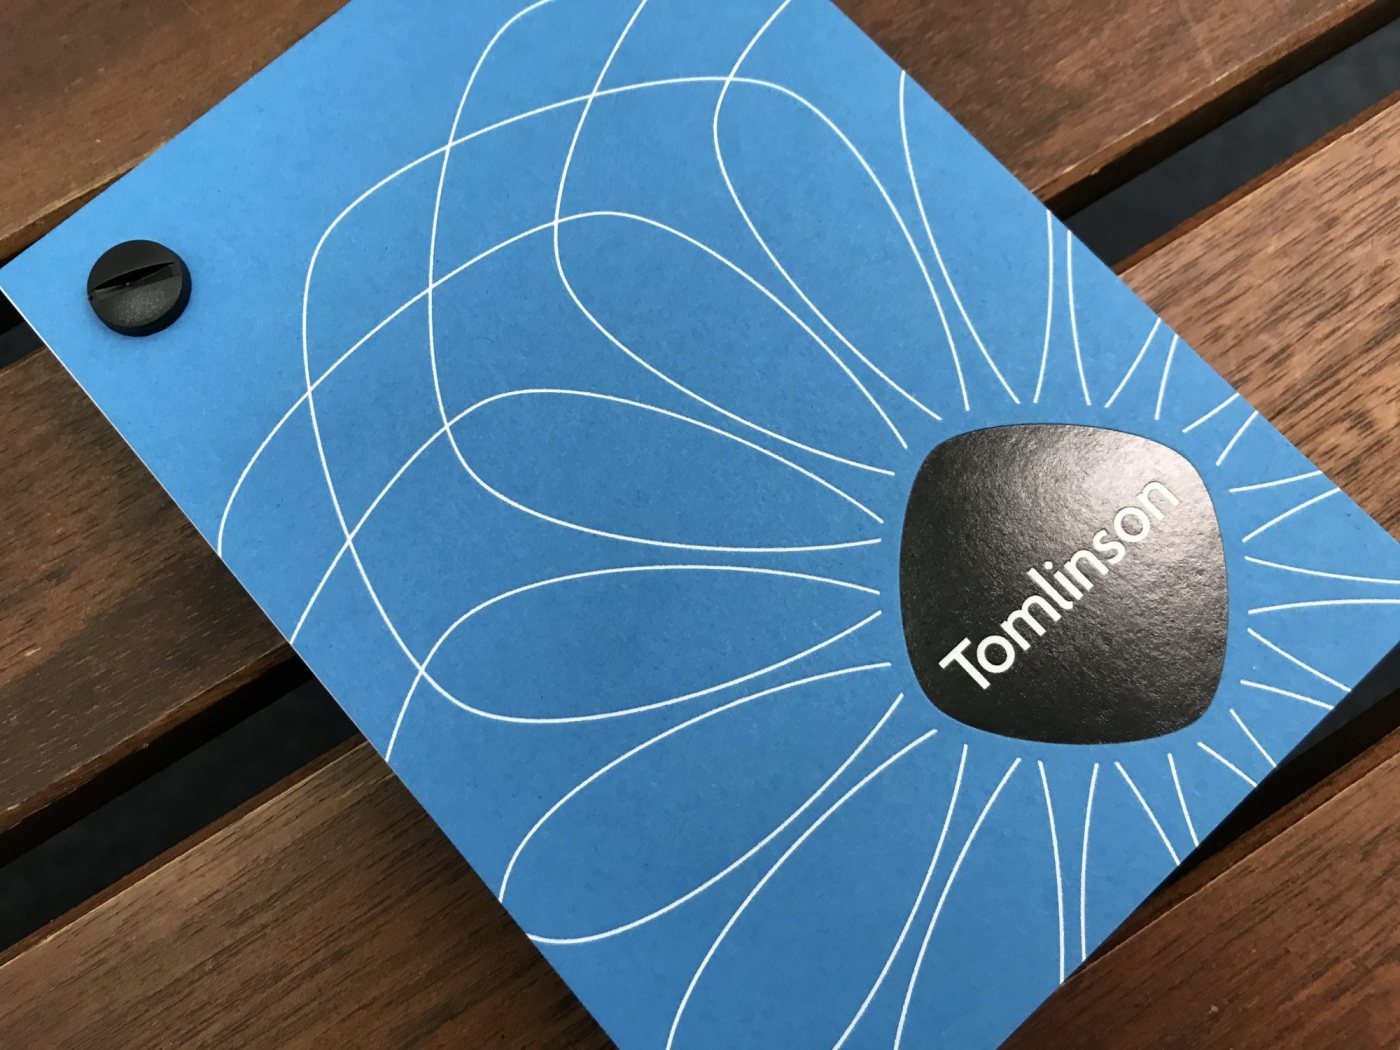 Tomlinson Limited brochure